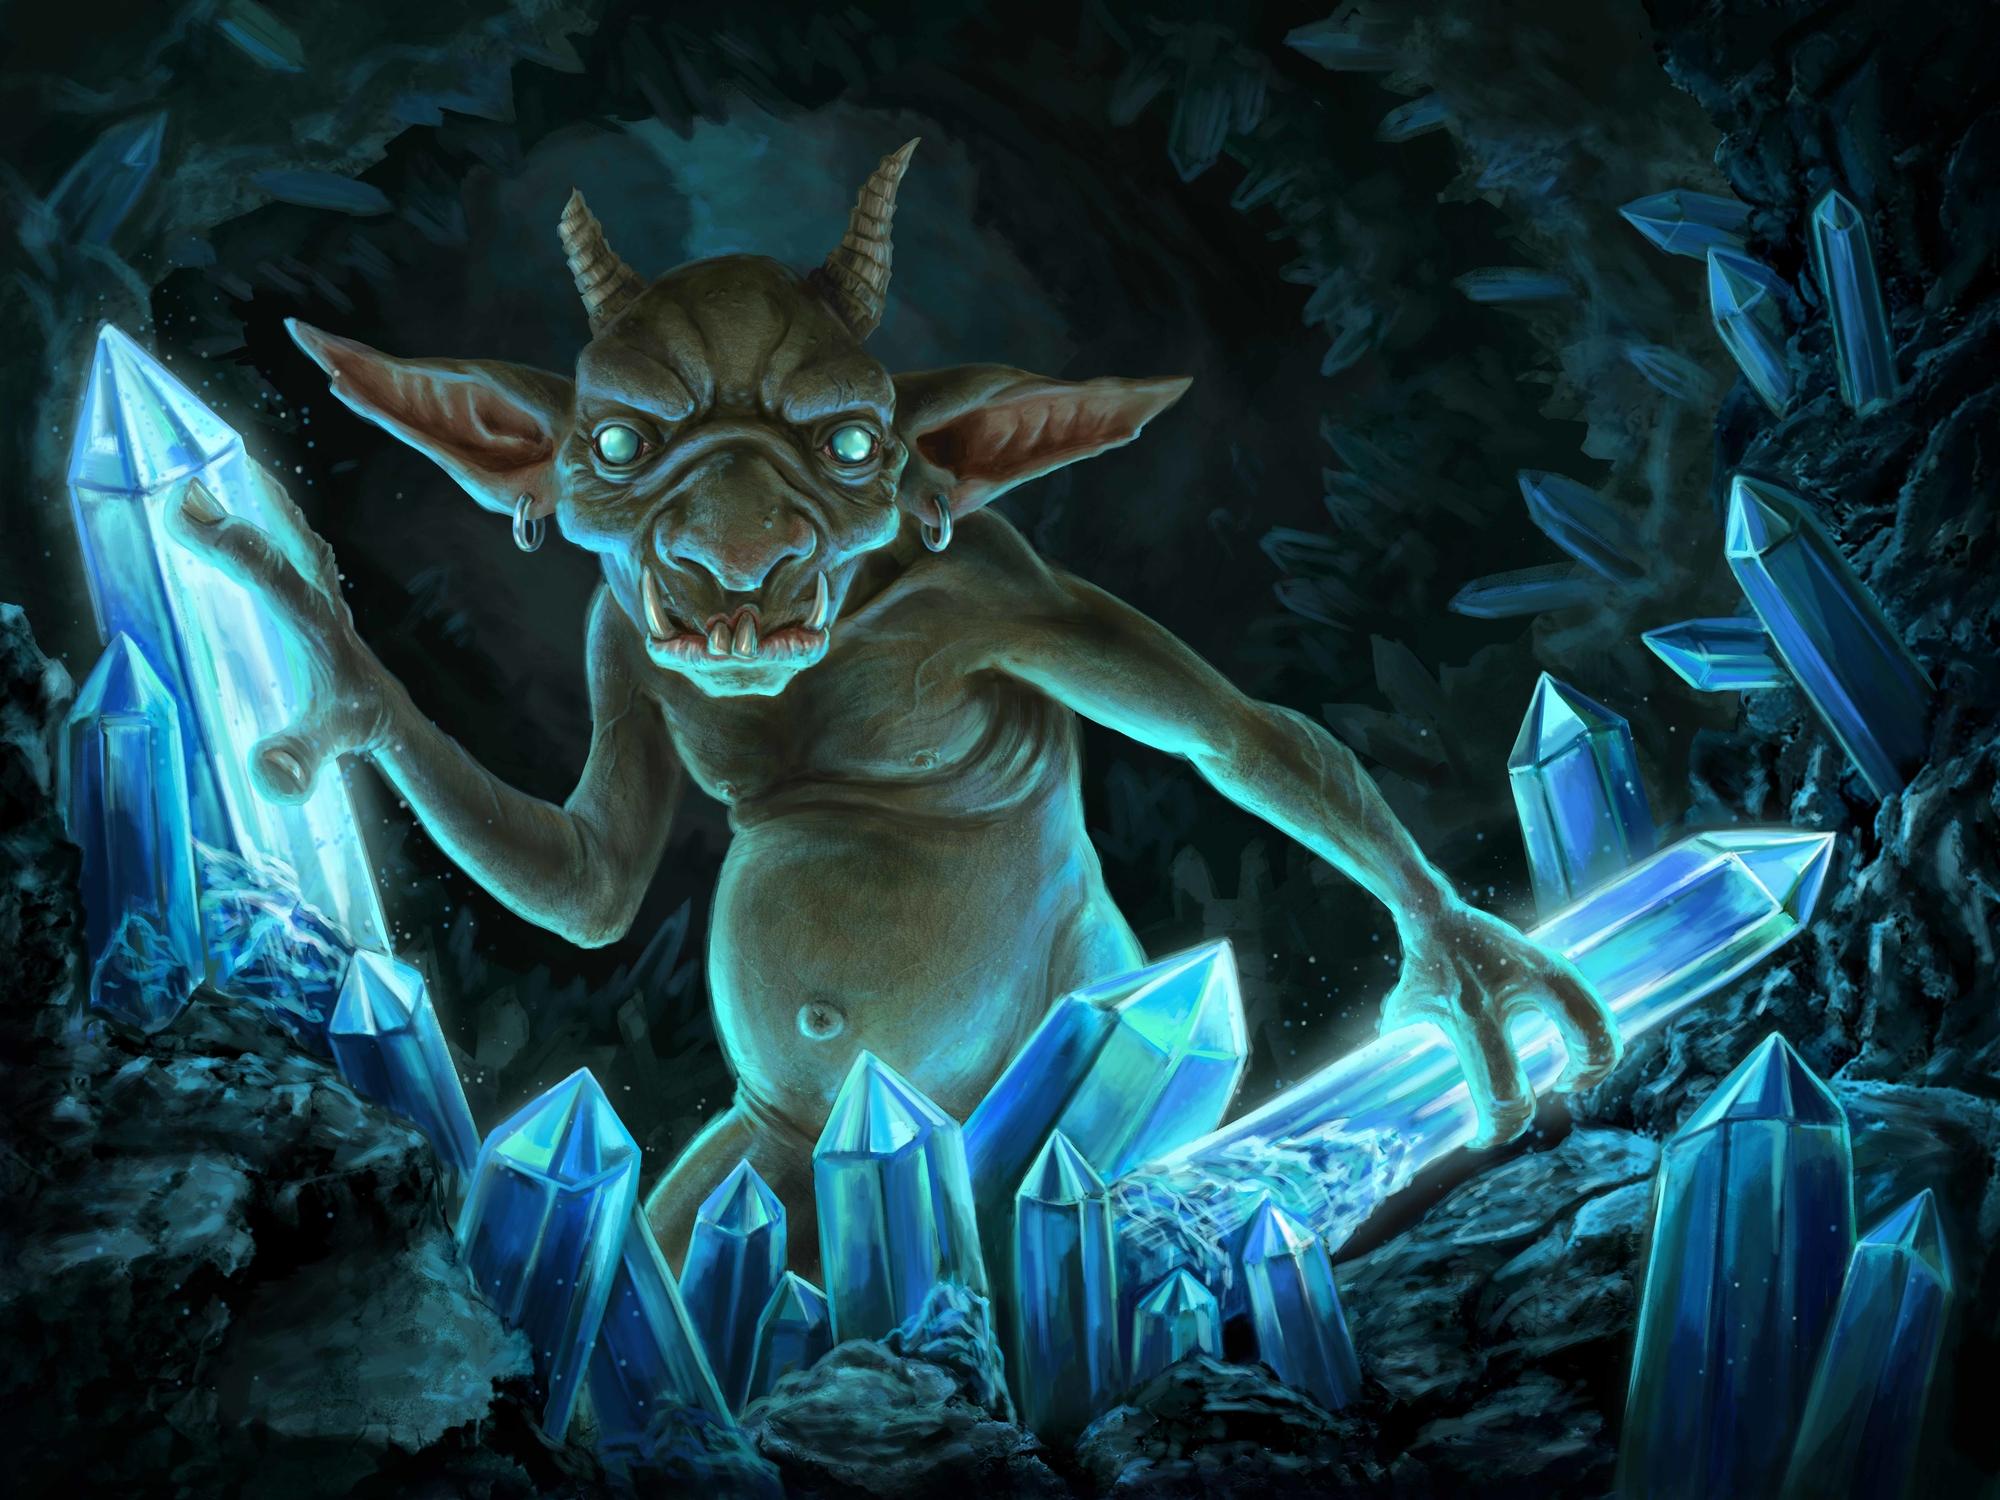 Cave Goblin Artwork by Elissa  Weaver